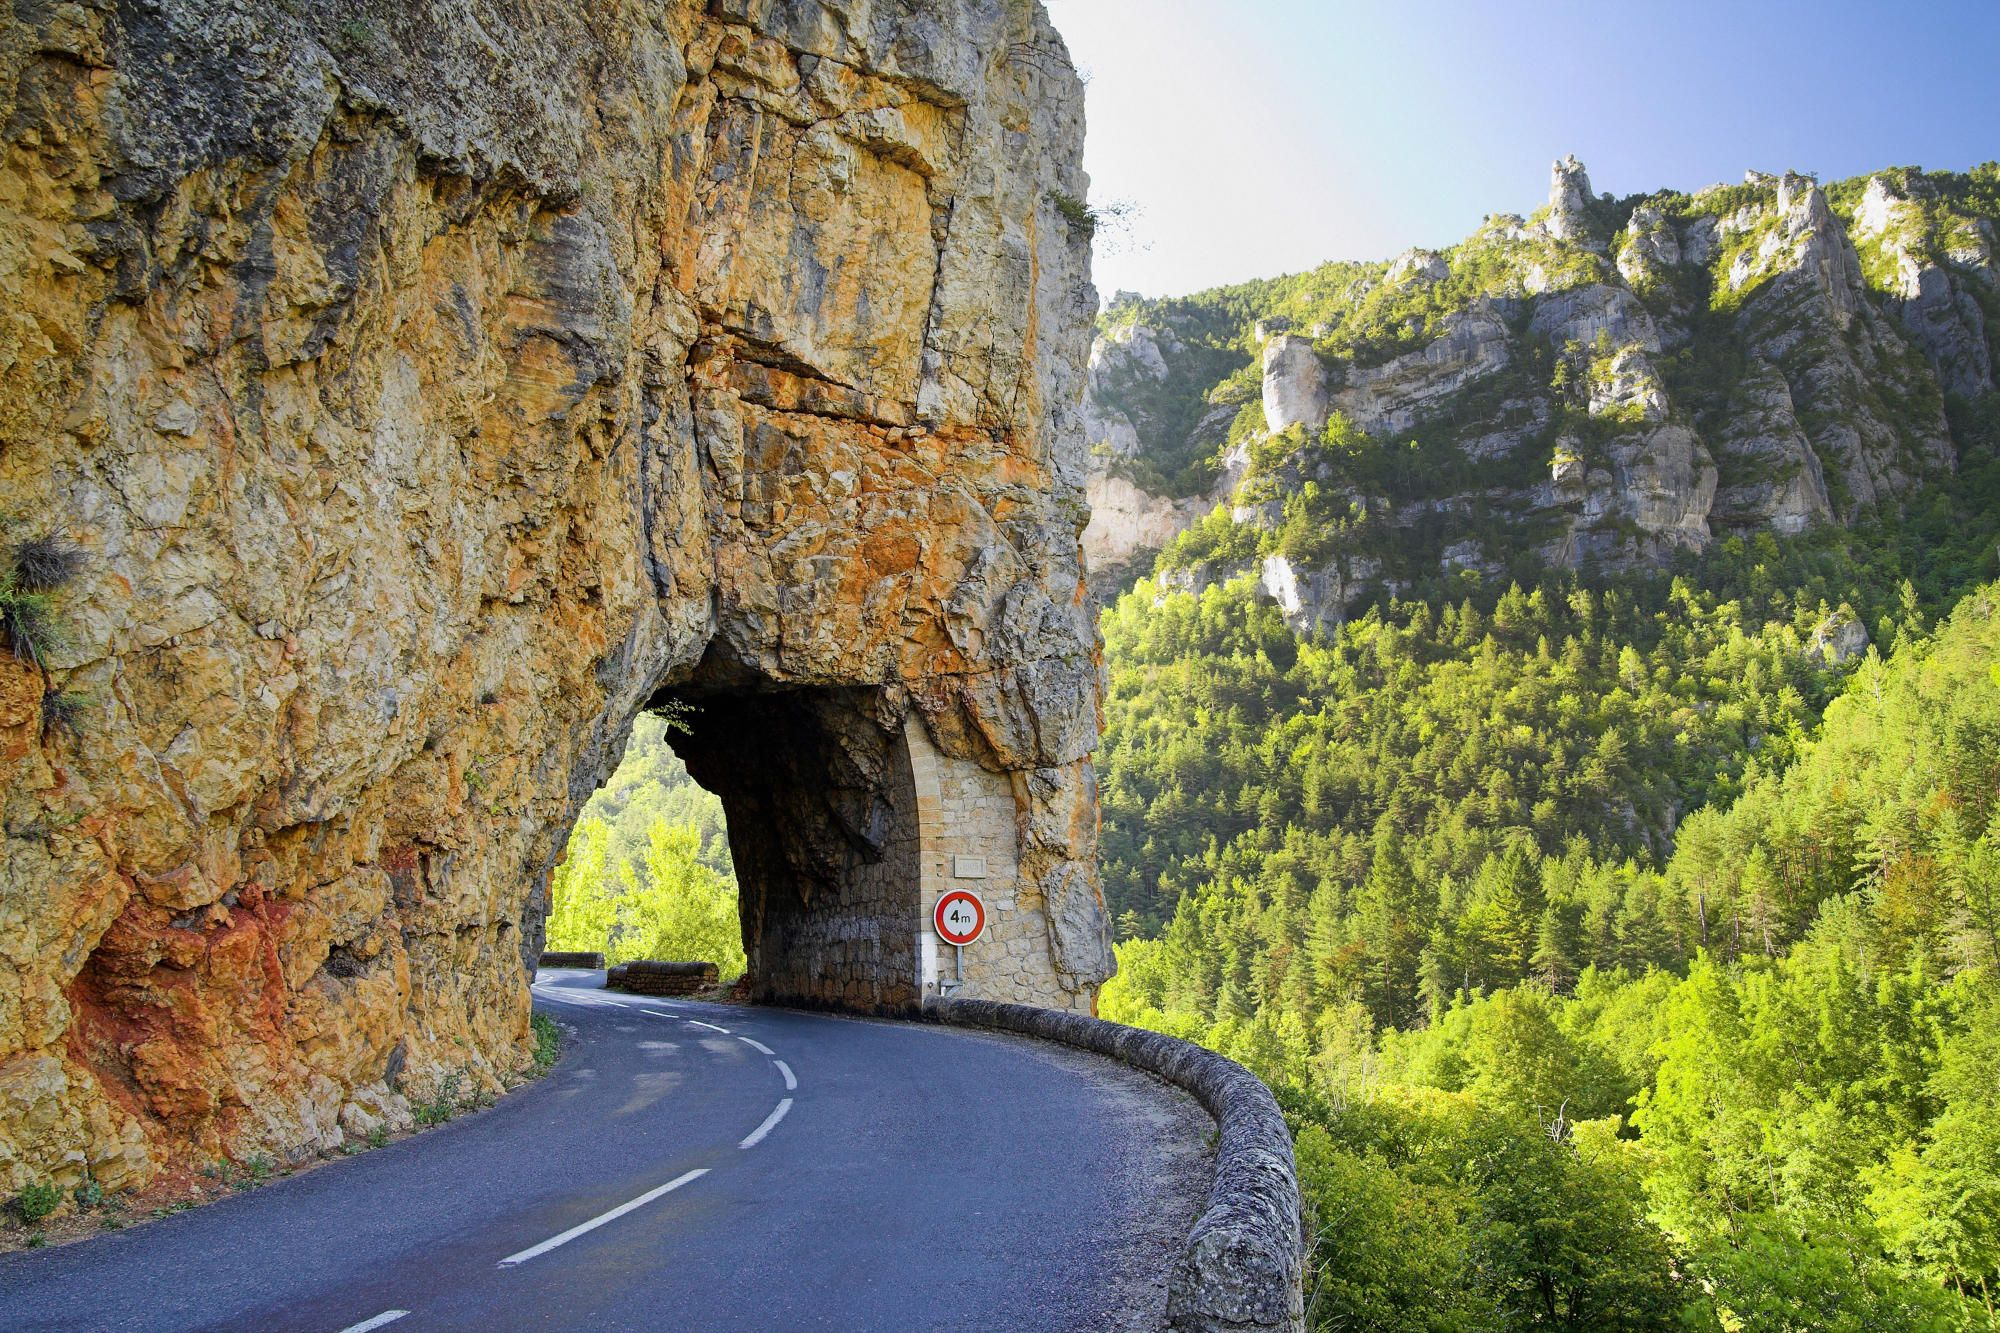 Gorges Du Tarn Cevennes National Park Languedoc Roussillon France Frankrijk Vakanties Reizen